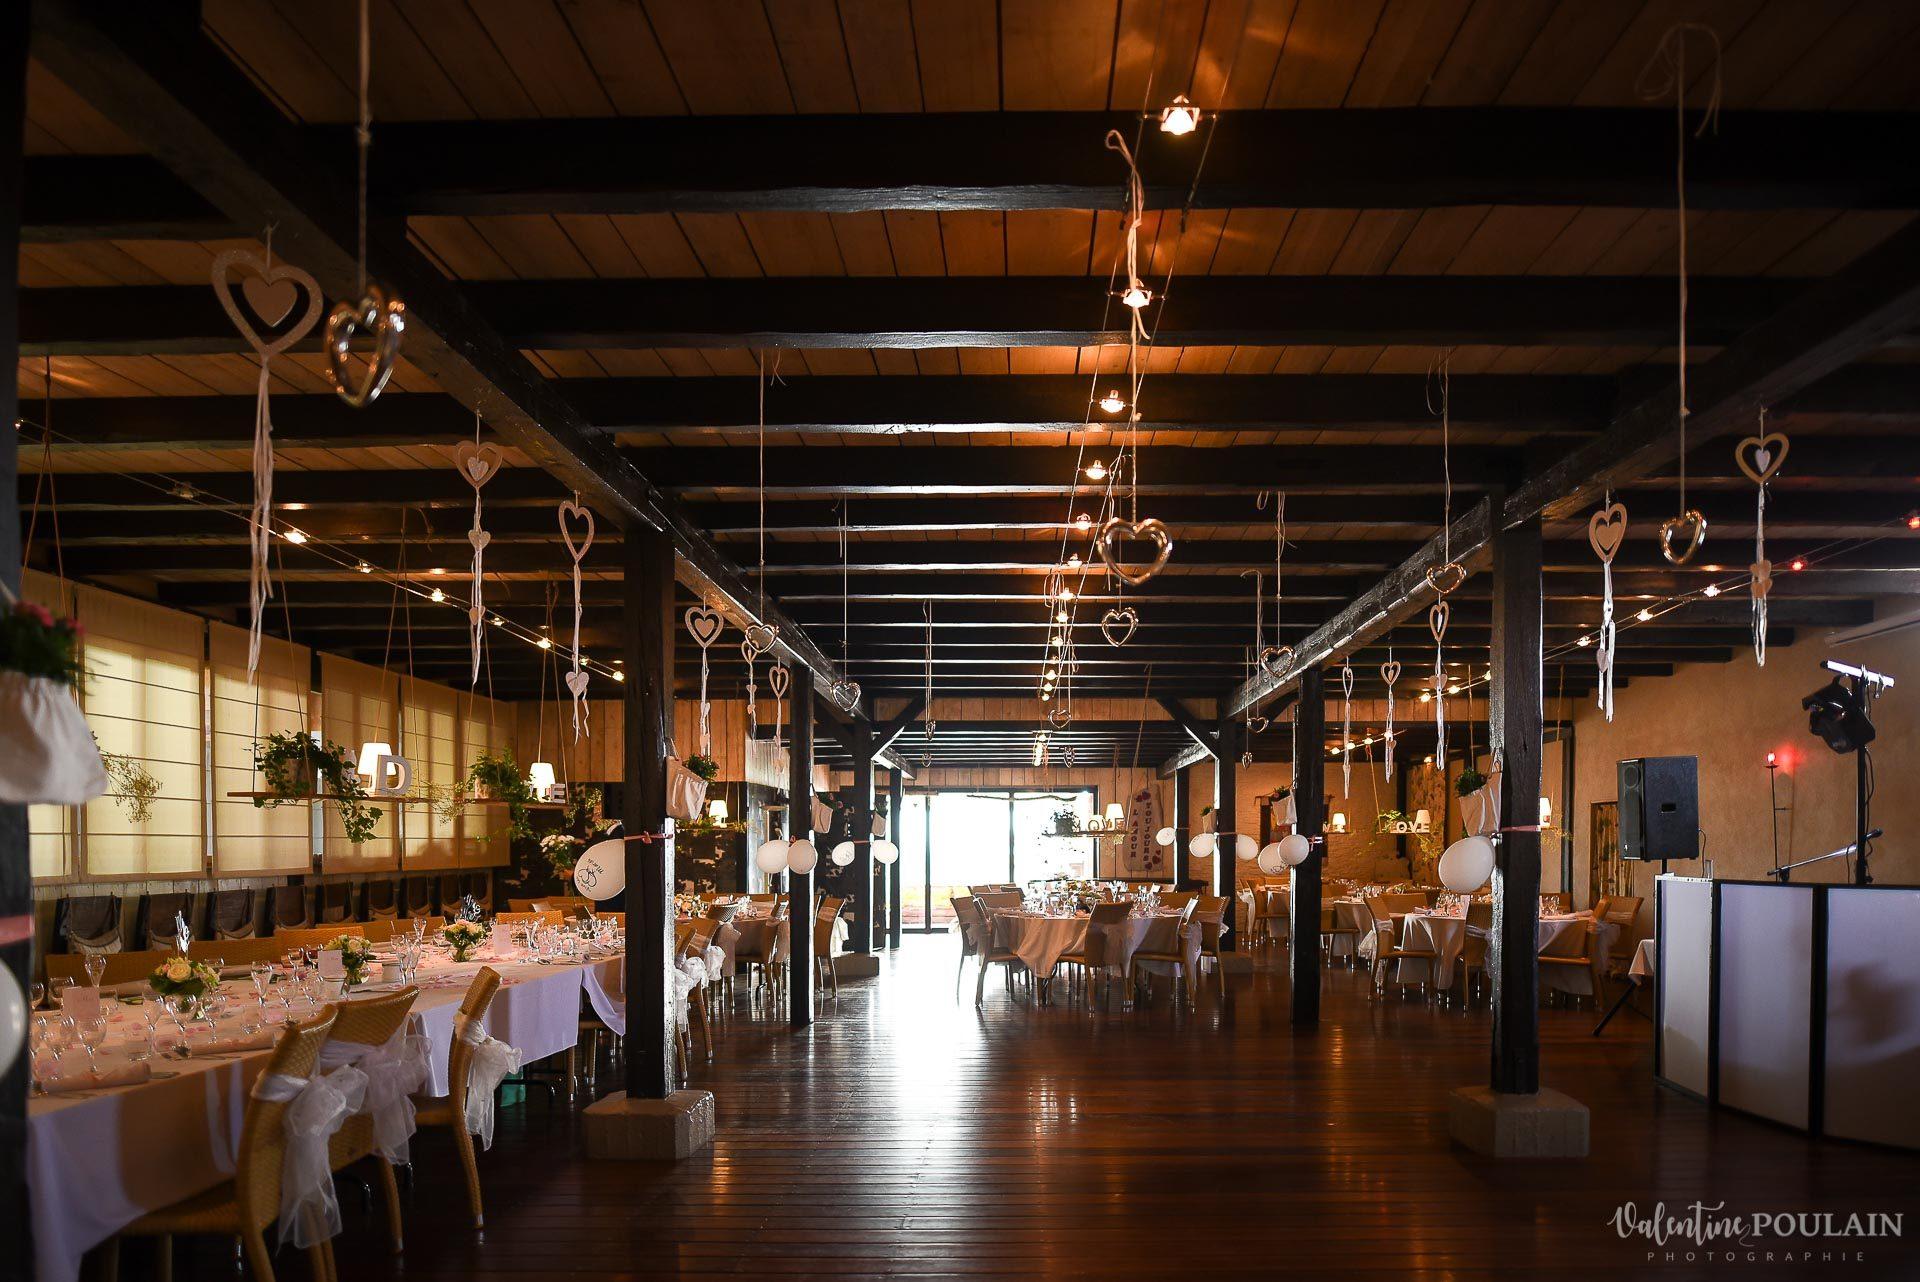 Mariage cool ferme weyerbach - Valentine Poulain lieu